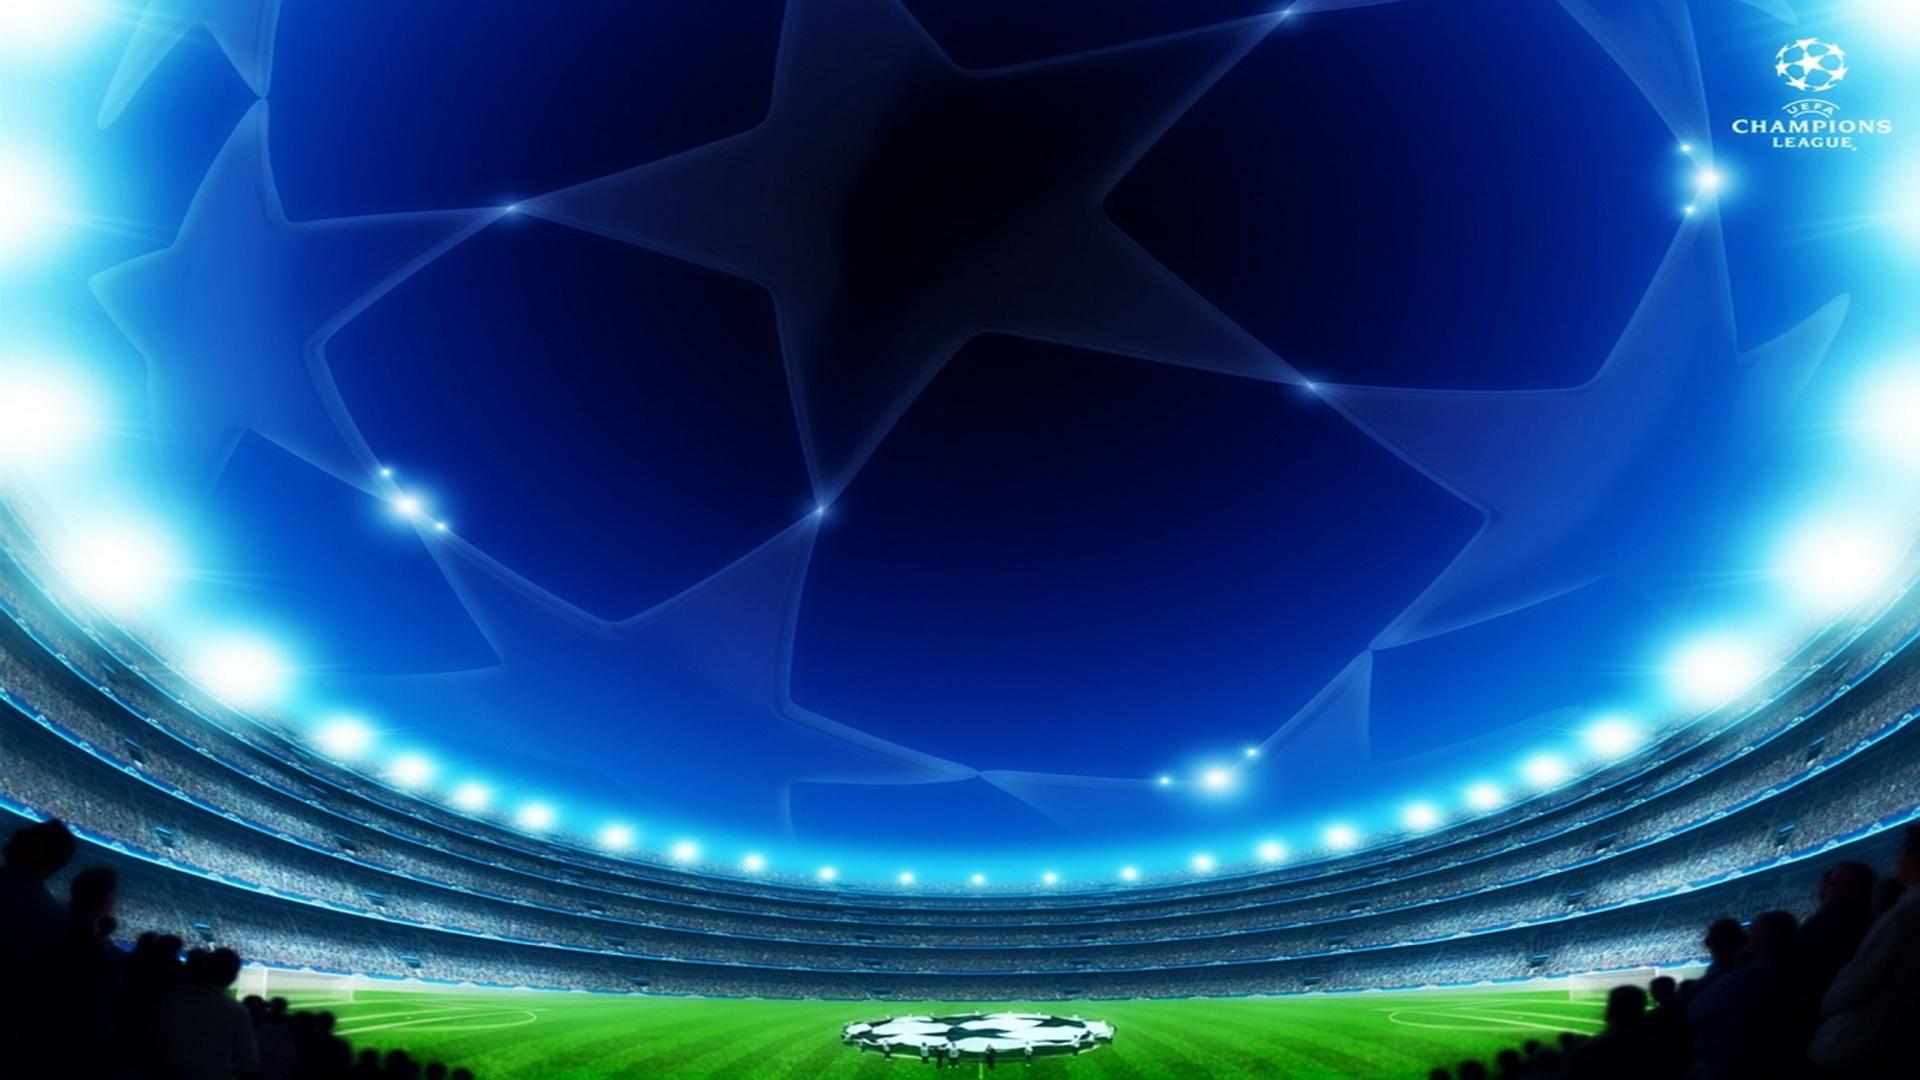 uefa champions league high wallpapers Sport Wallpaper HD 1920x1080